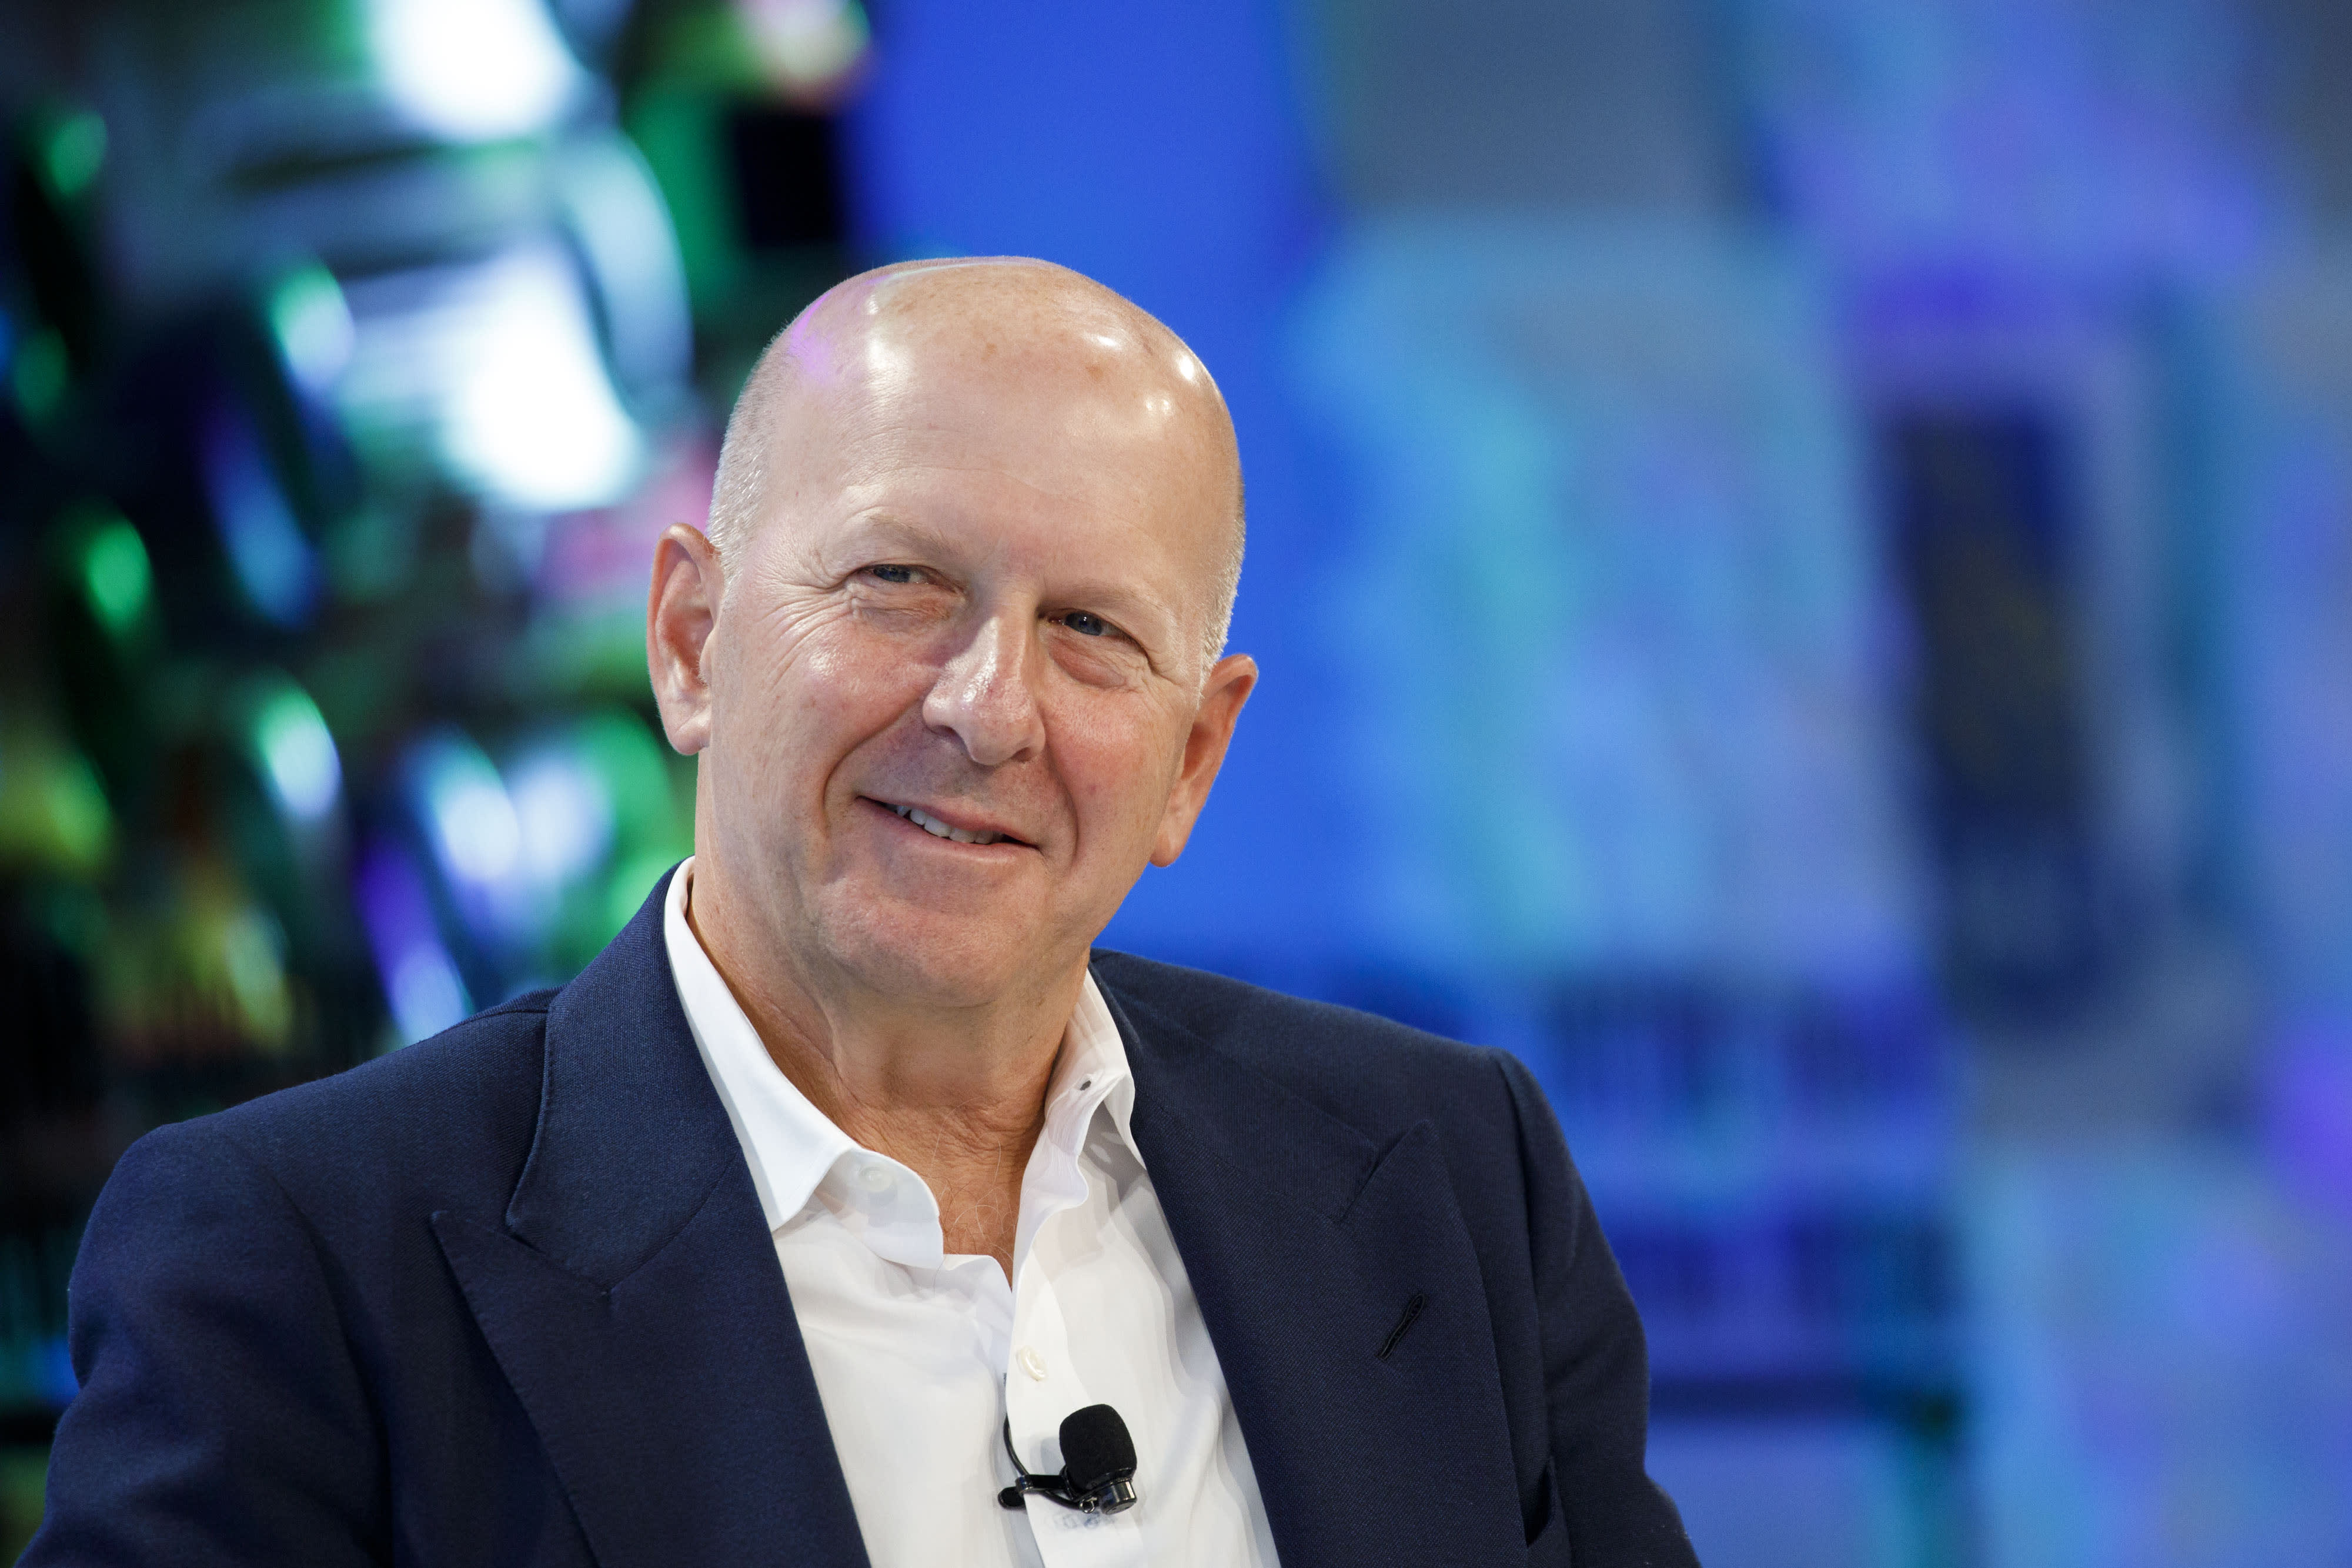 Goldman Sachs CEO Solomon addresses 1MDB scandal